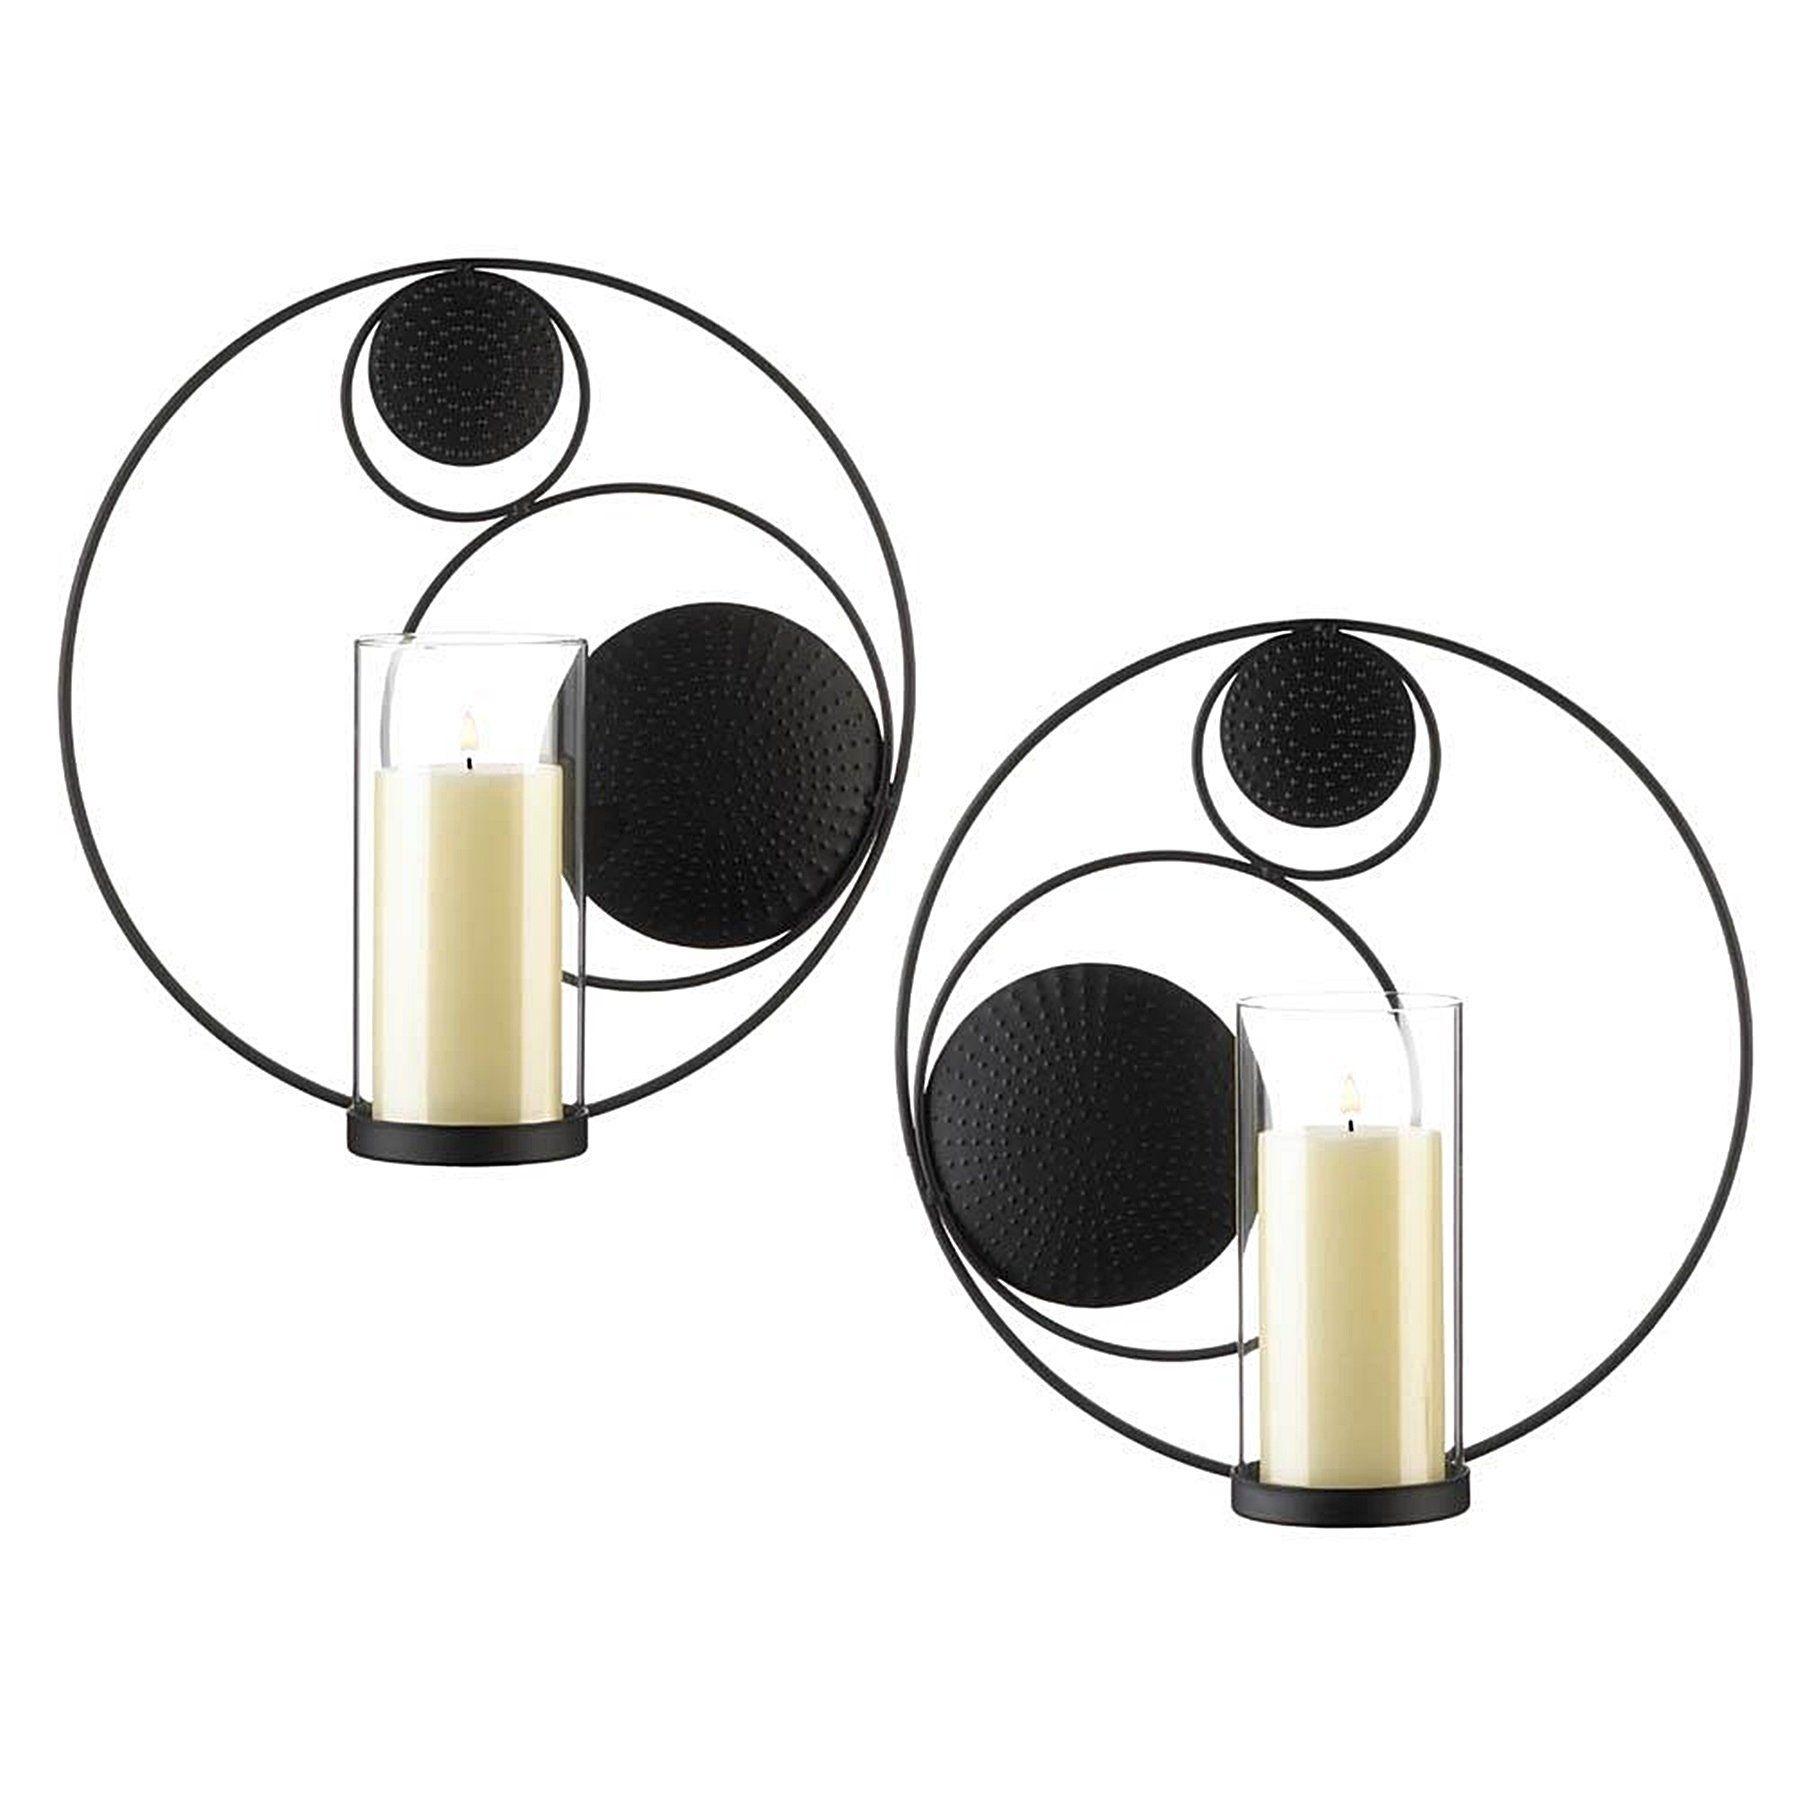 Hoover Elegant Candle Wall Sconces Set Of 2 Black Glass Candle Wall Sconces Candle Sconces Wall Sconces